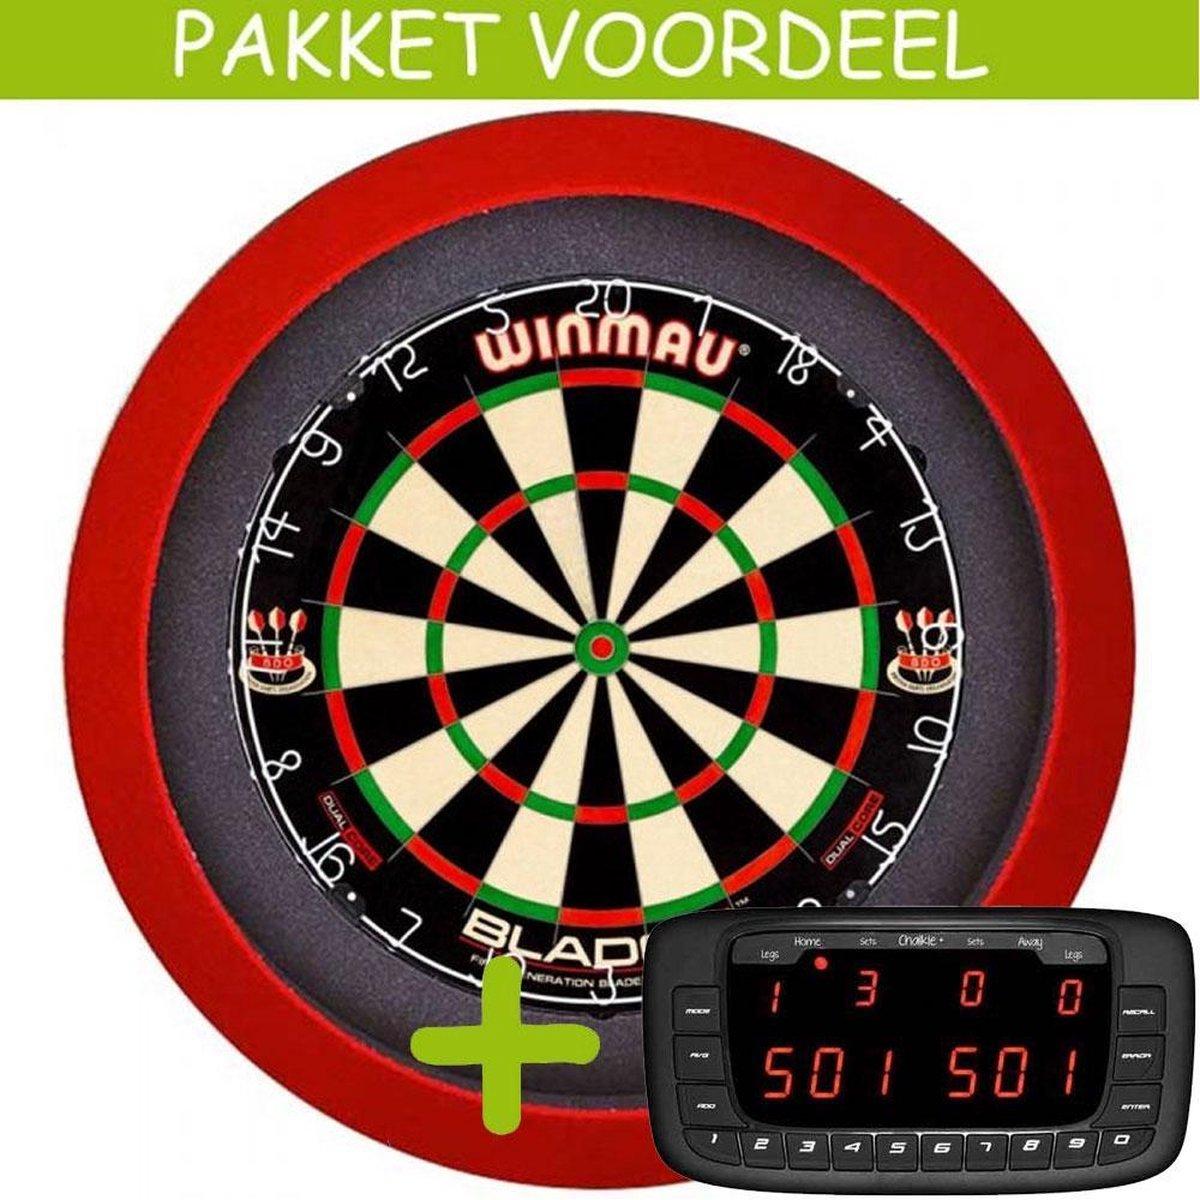 Elektronisch Dart Scorebord VoordeelPakket (Chalkie + ) - Dual Core - Dartbordverlichting Basic (Rood)